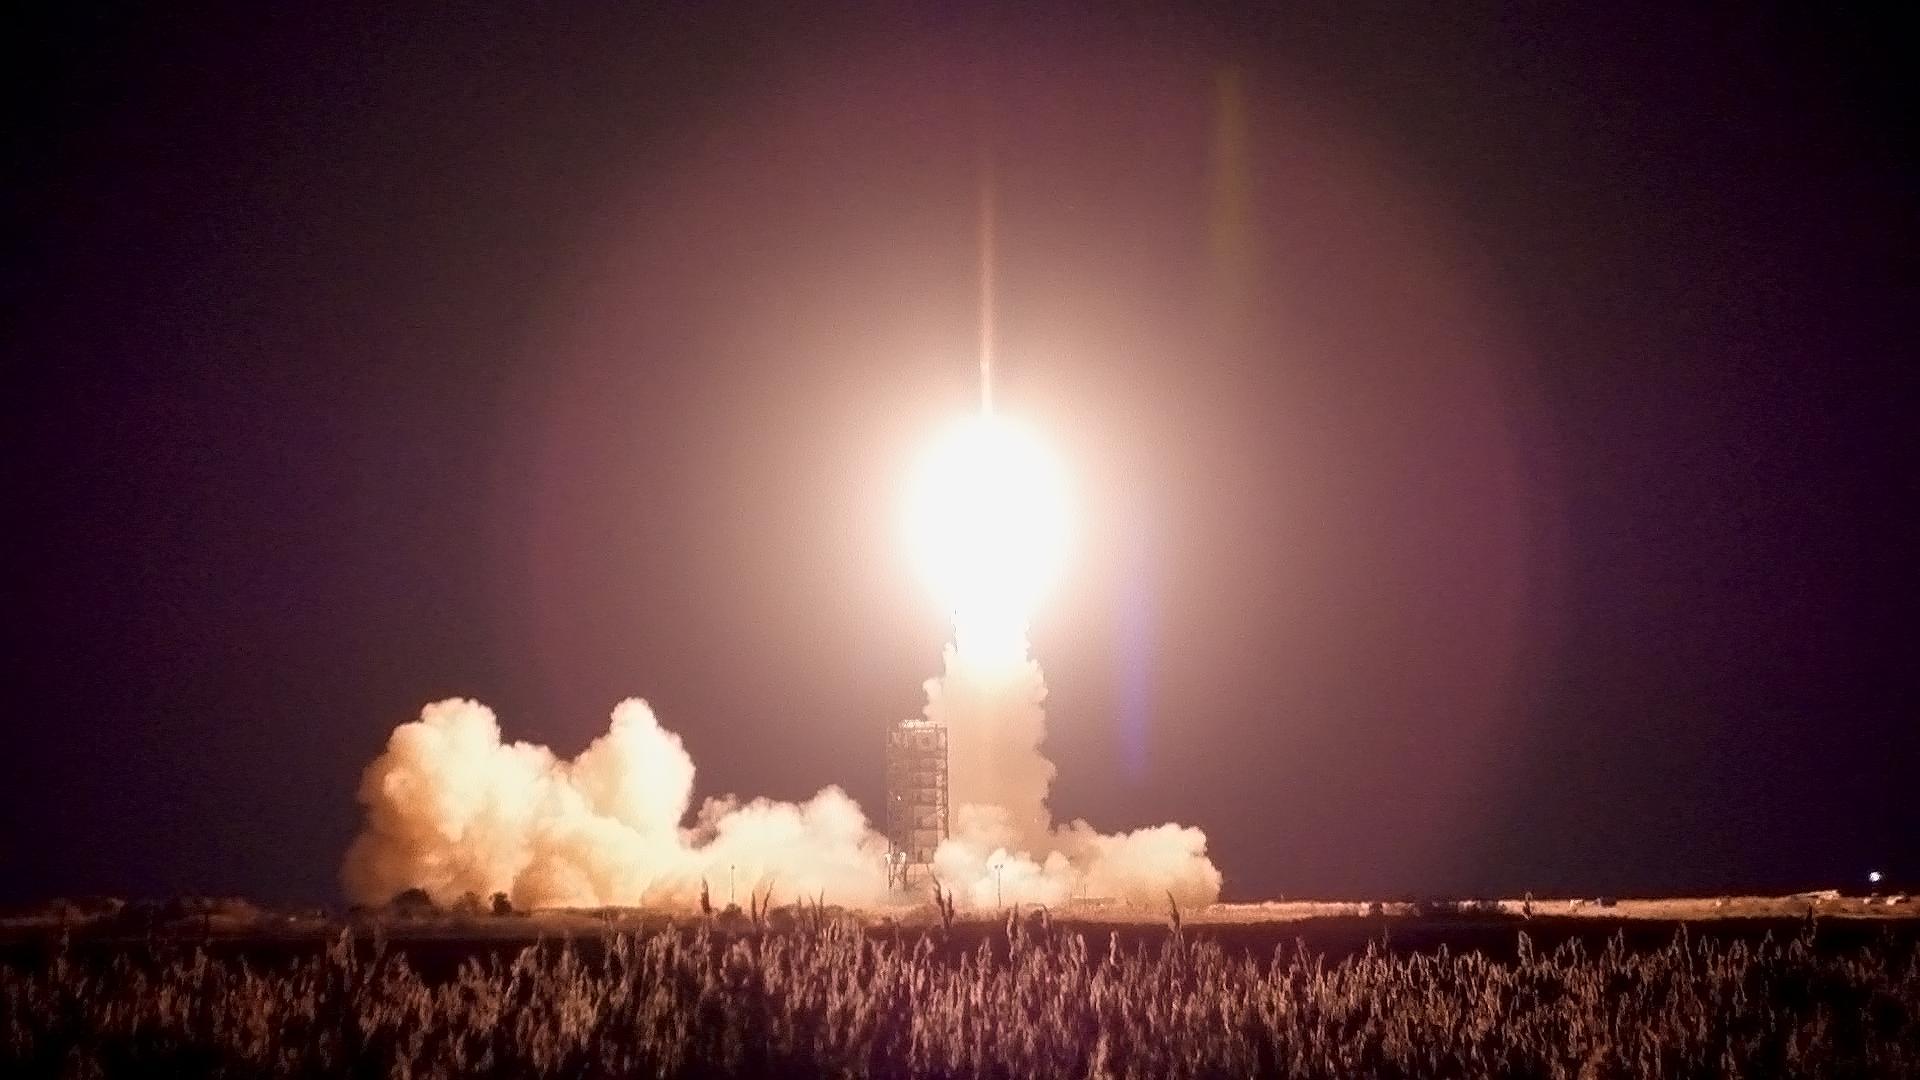 Minotaur 1 Rocket Launch: Nov. 19, 2013